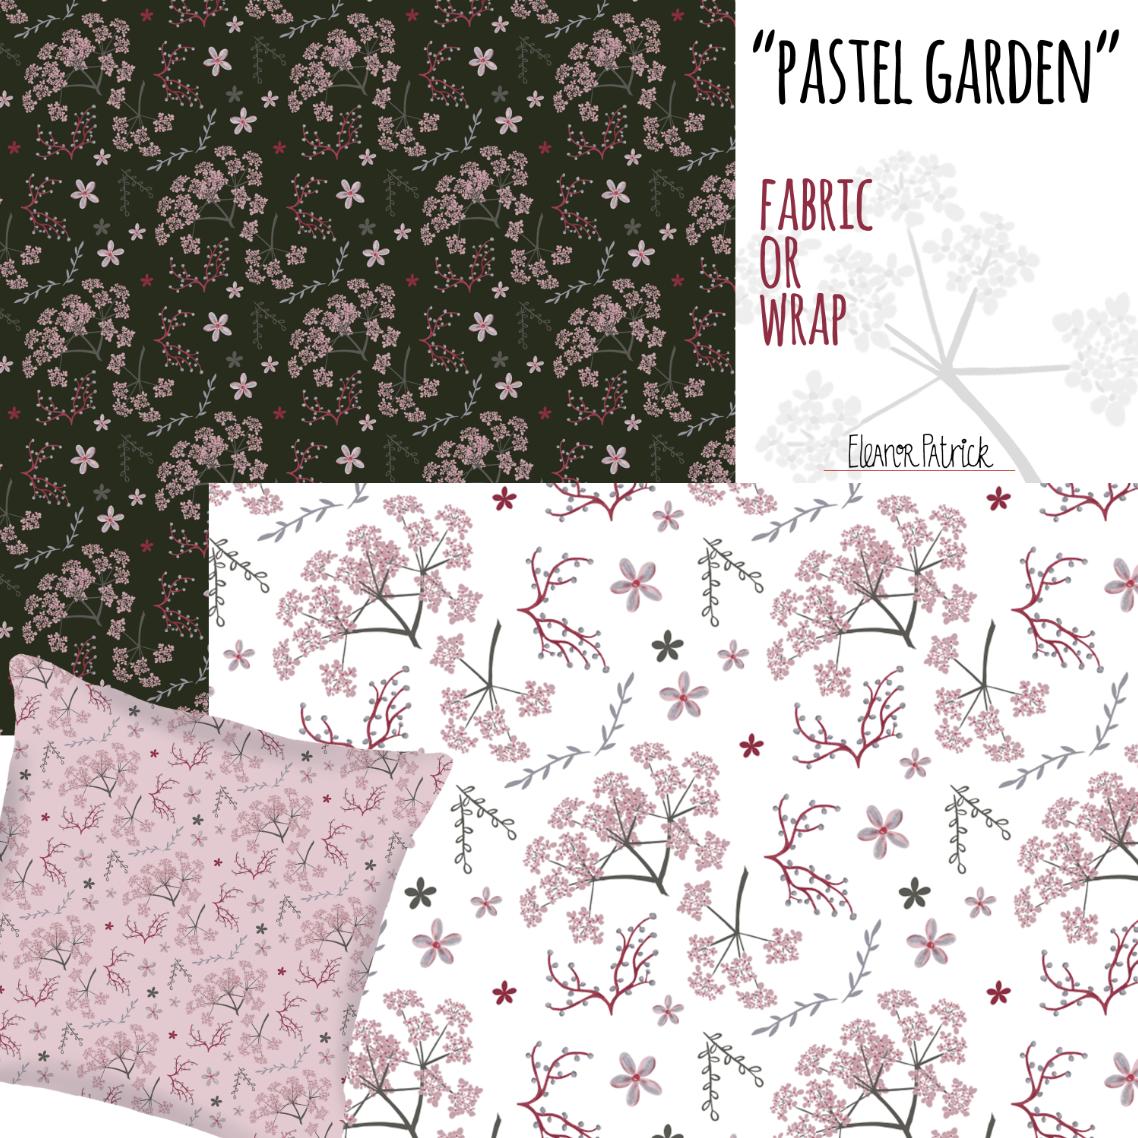 Pastel Garden fabric samples